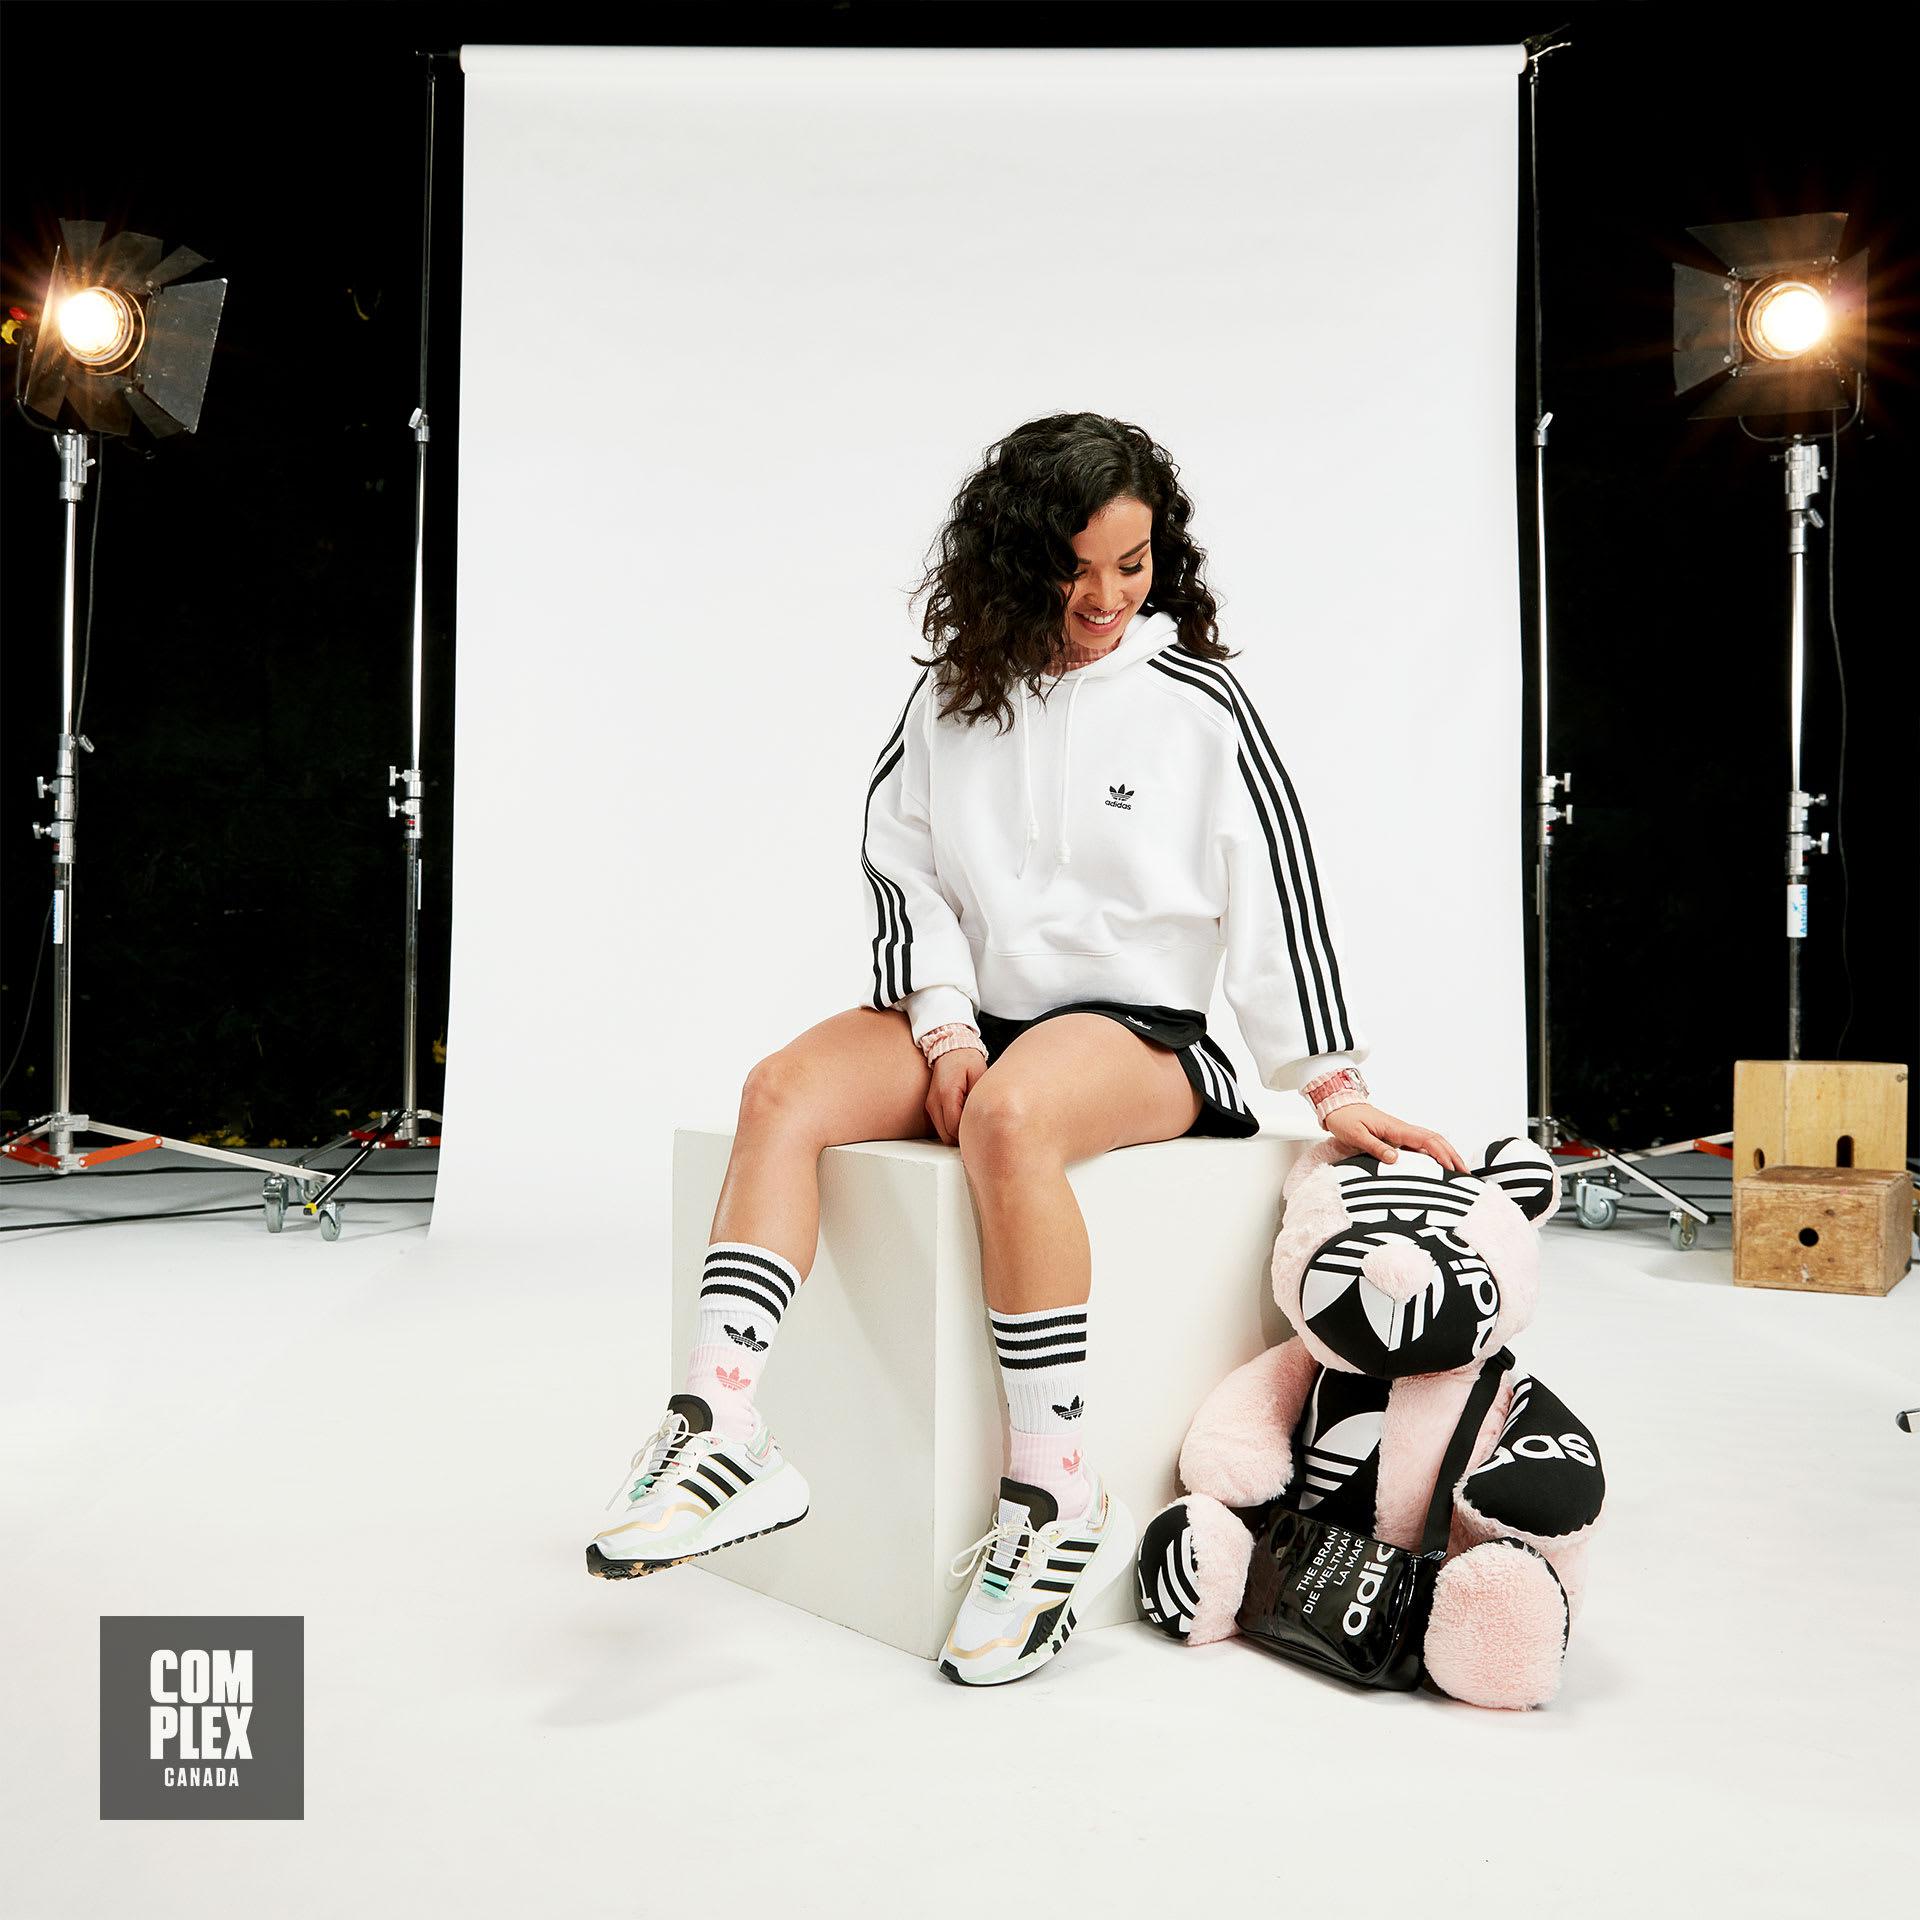 Toronto upcycling artist Natalya Amres poses in adidas RYV